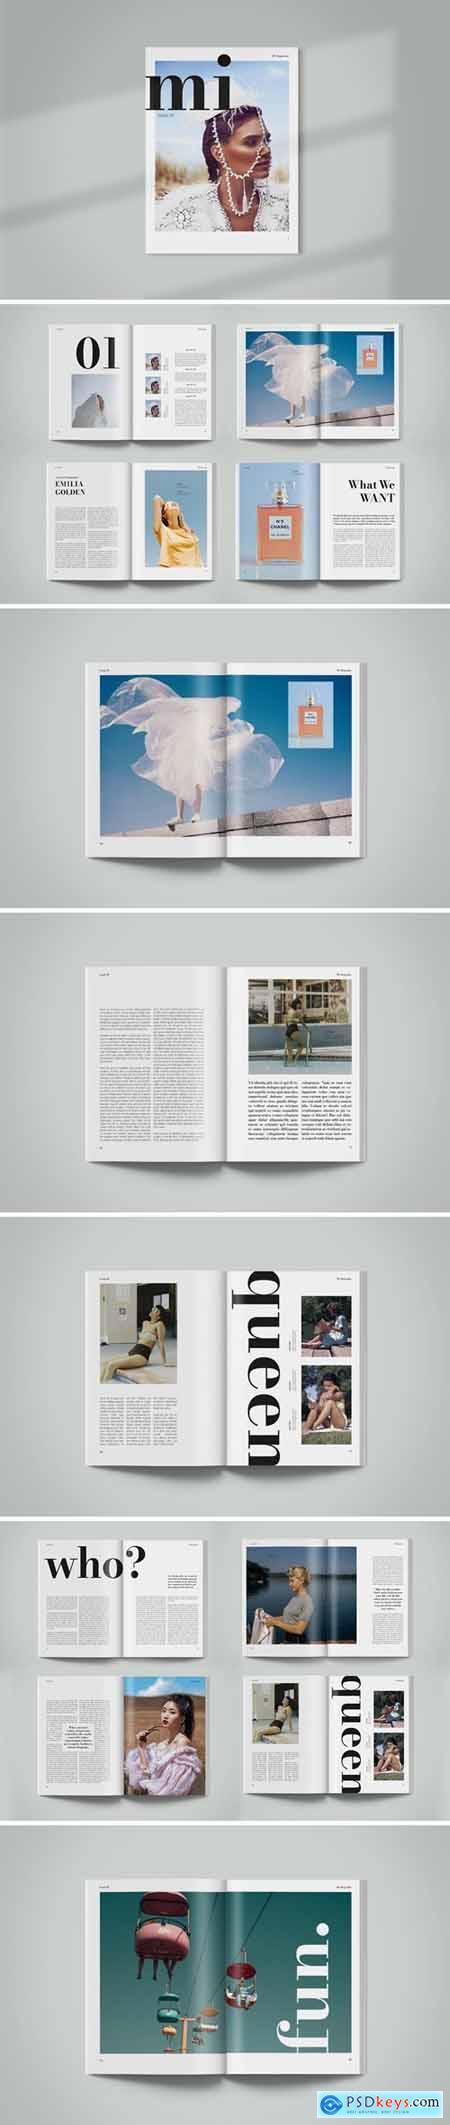 Magazine Template - Mi